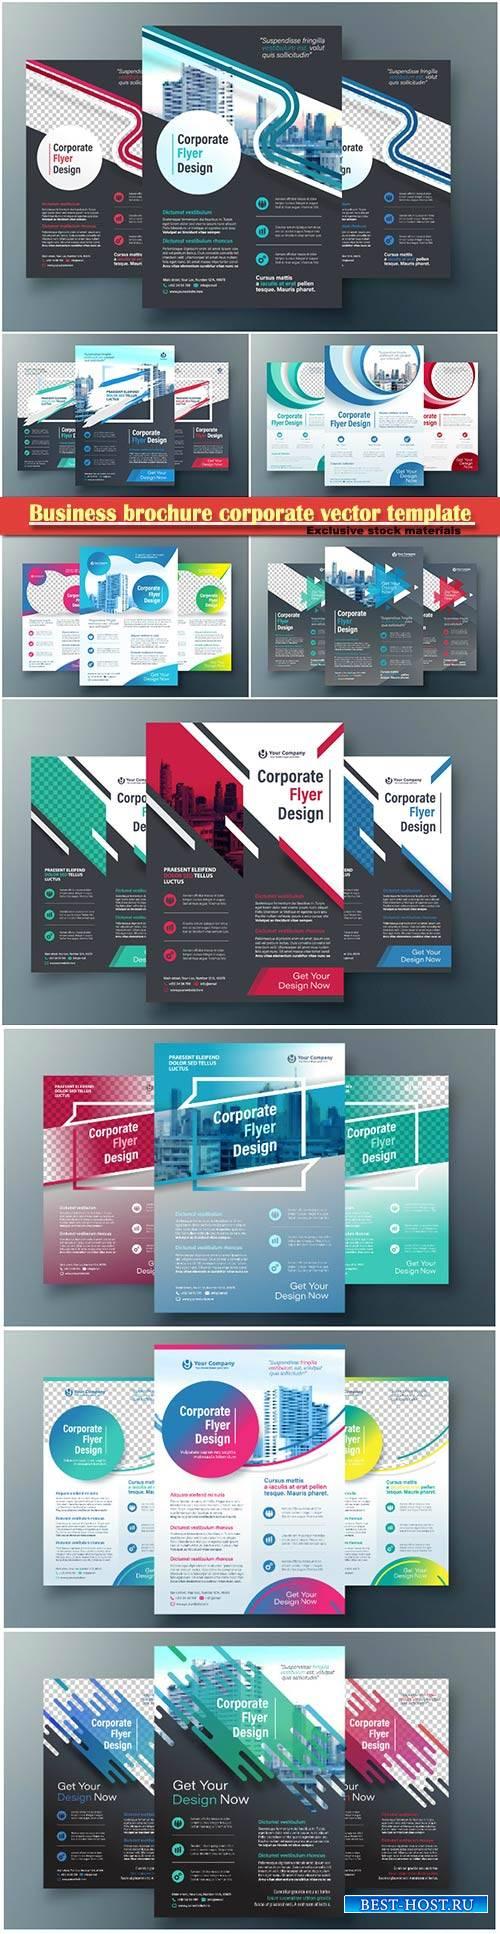 Business brochure corporate vector template, magazine flyer mockup # 23